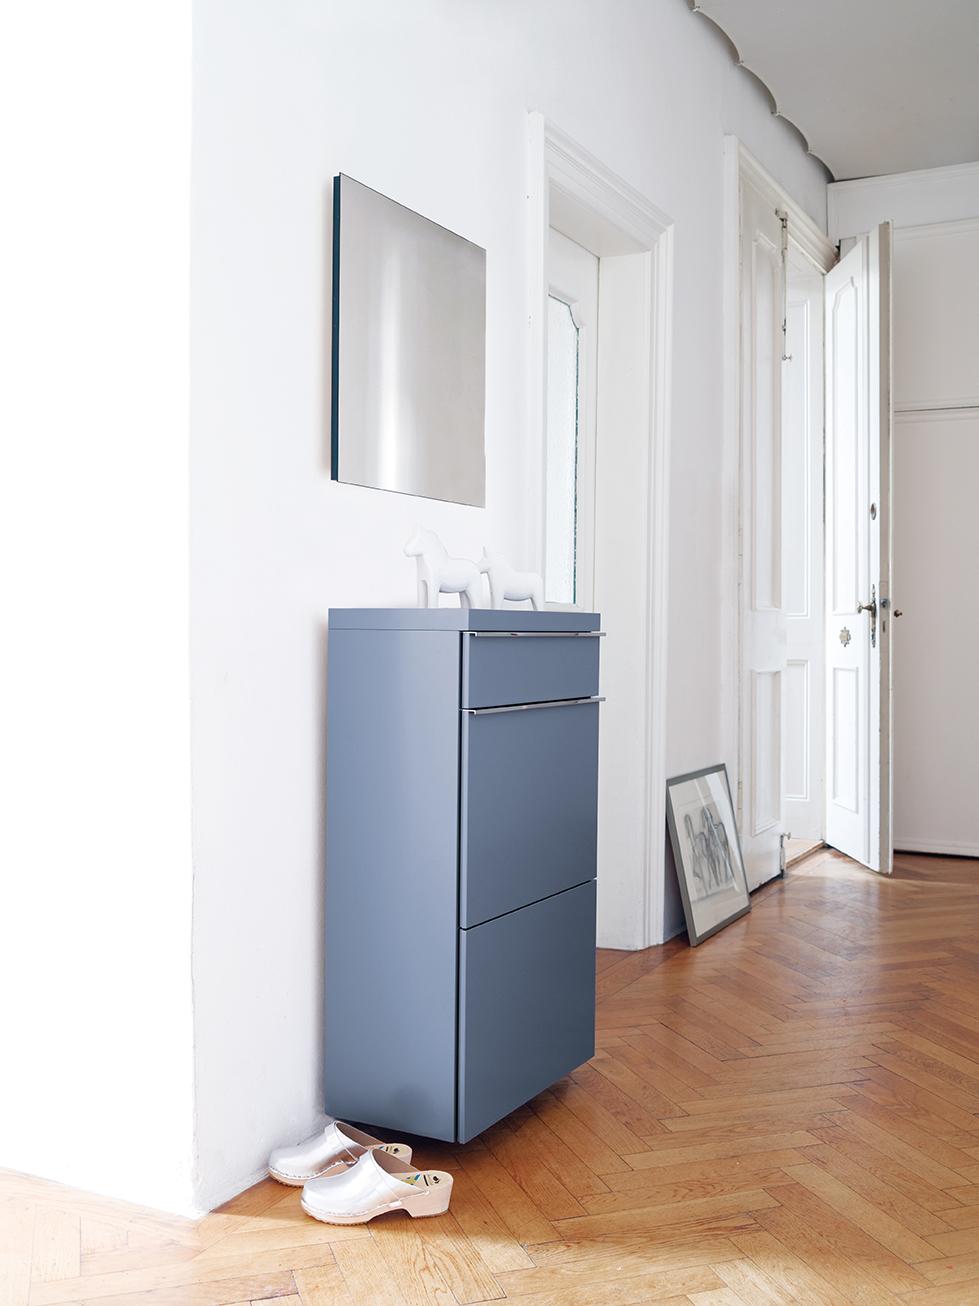 basic-schuhschrank-klappenschuhschrank-eisblau-schoenbuch-am-1.jpg